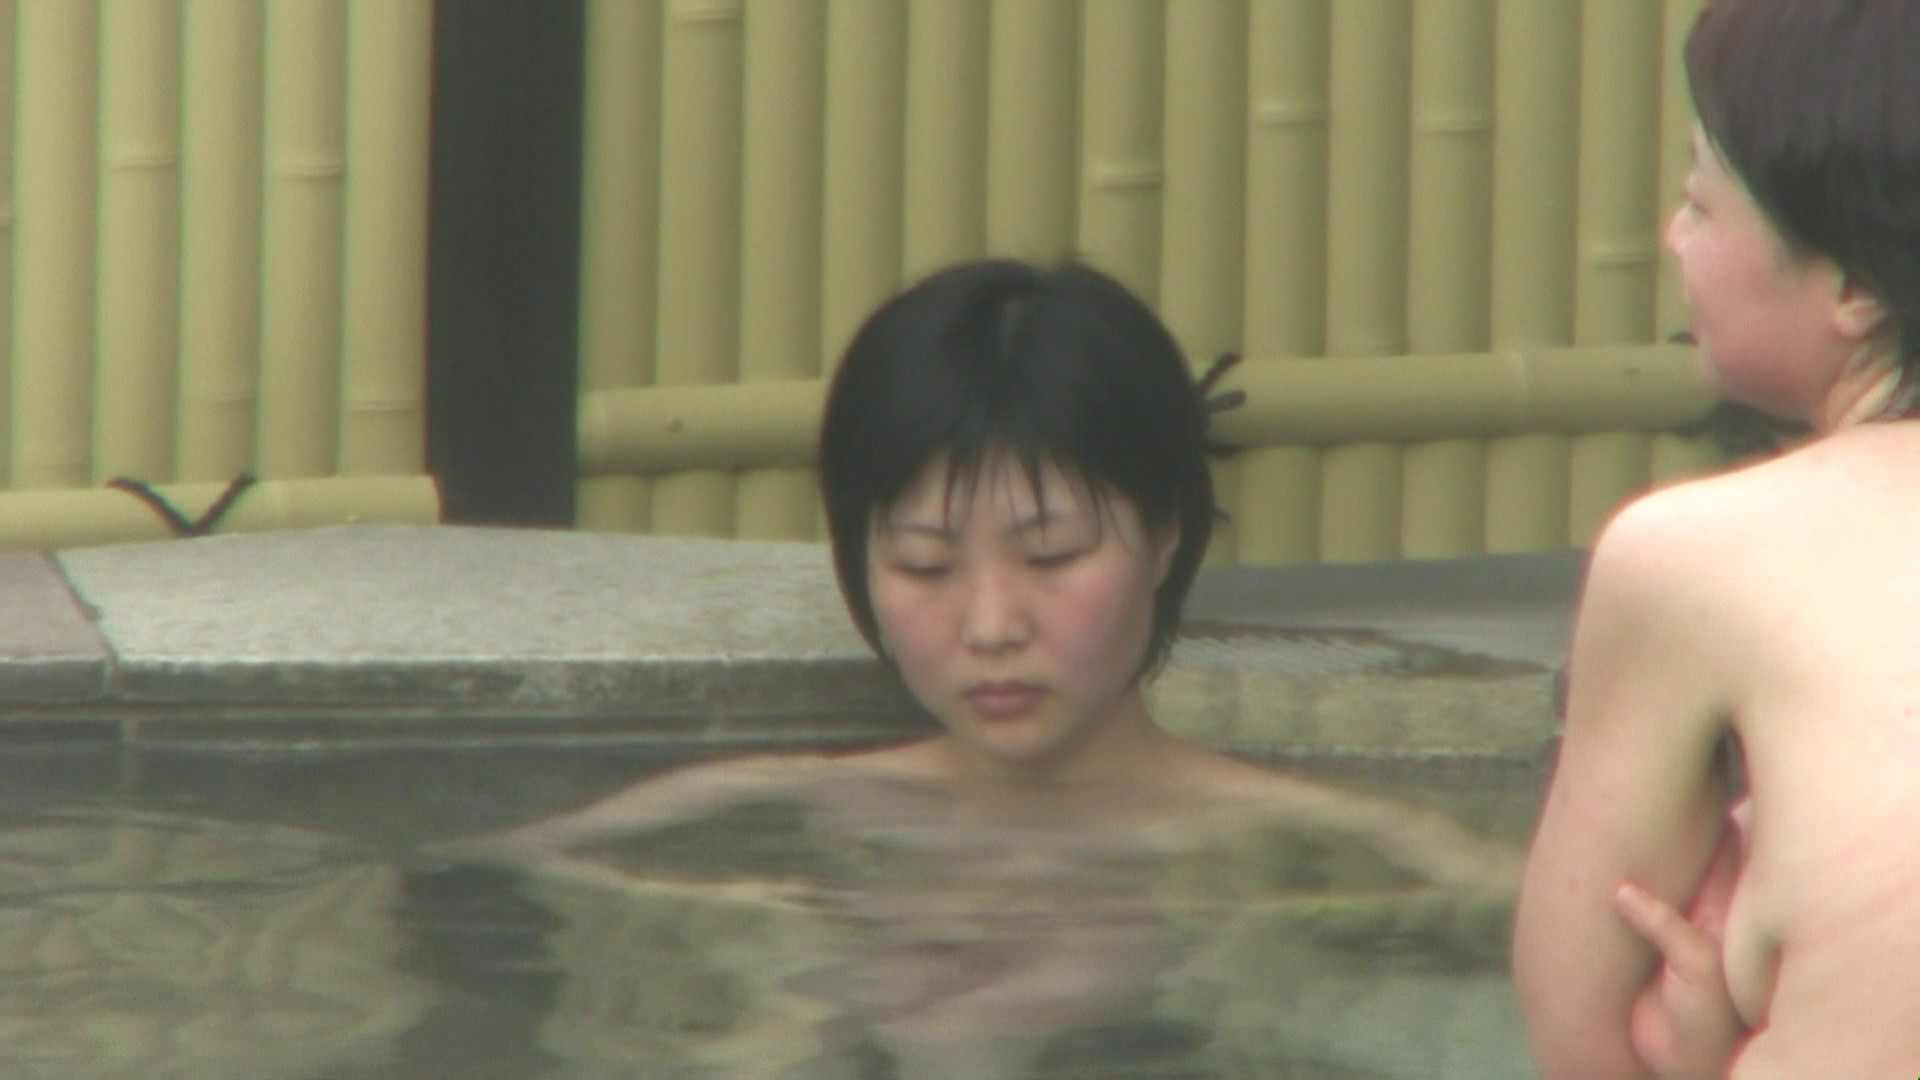 Aquaな露天風呂Vol.74【VIP限定】 OLセックス | 露天  68画像 55